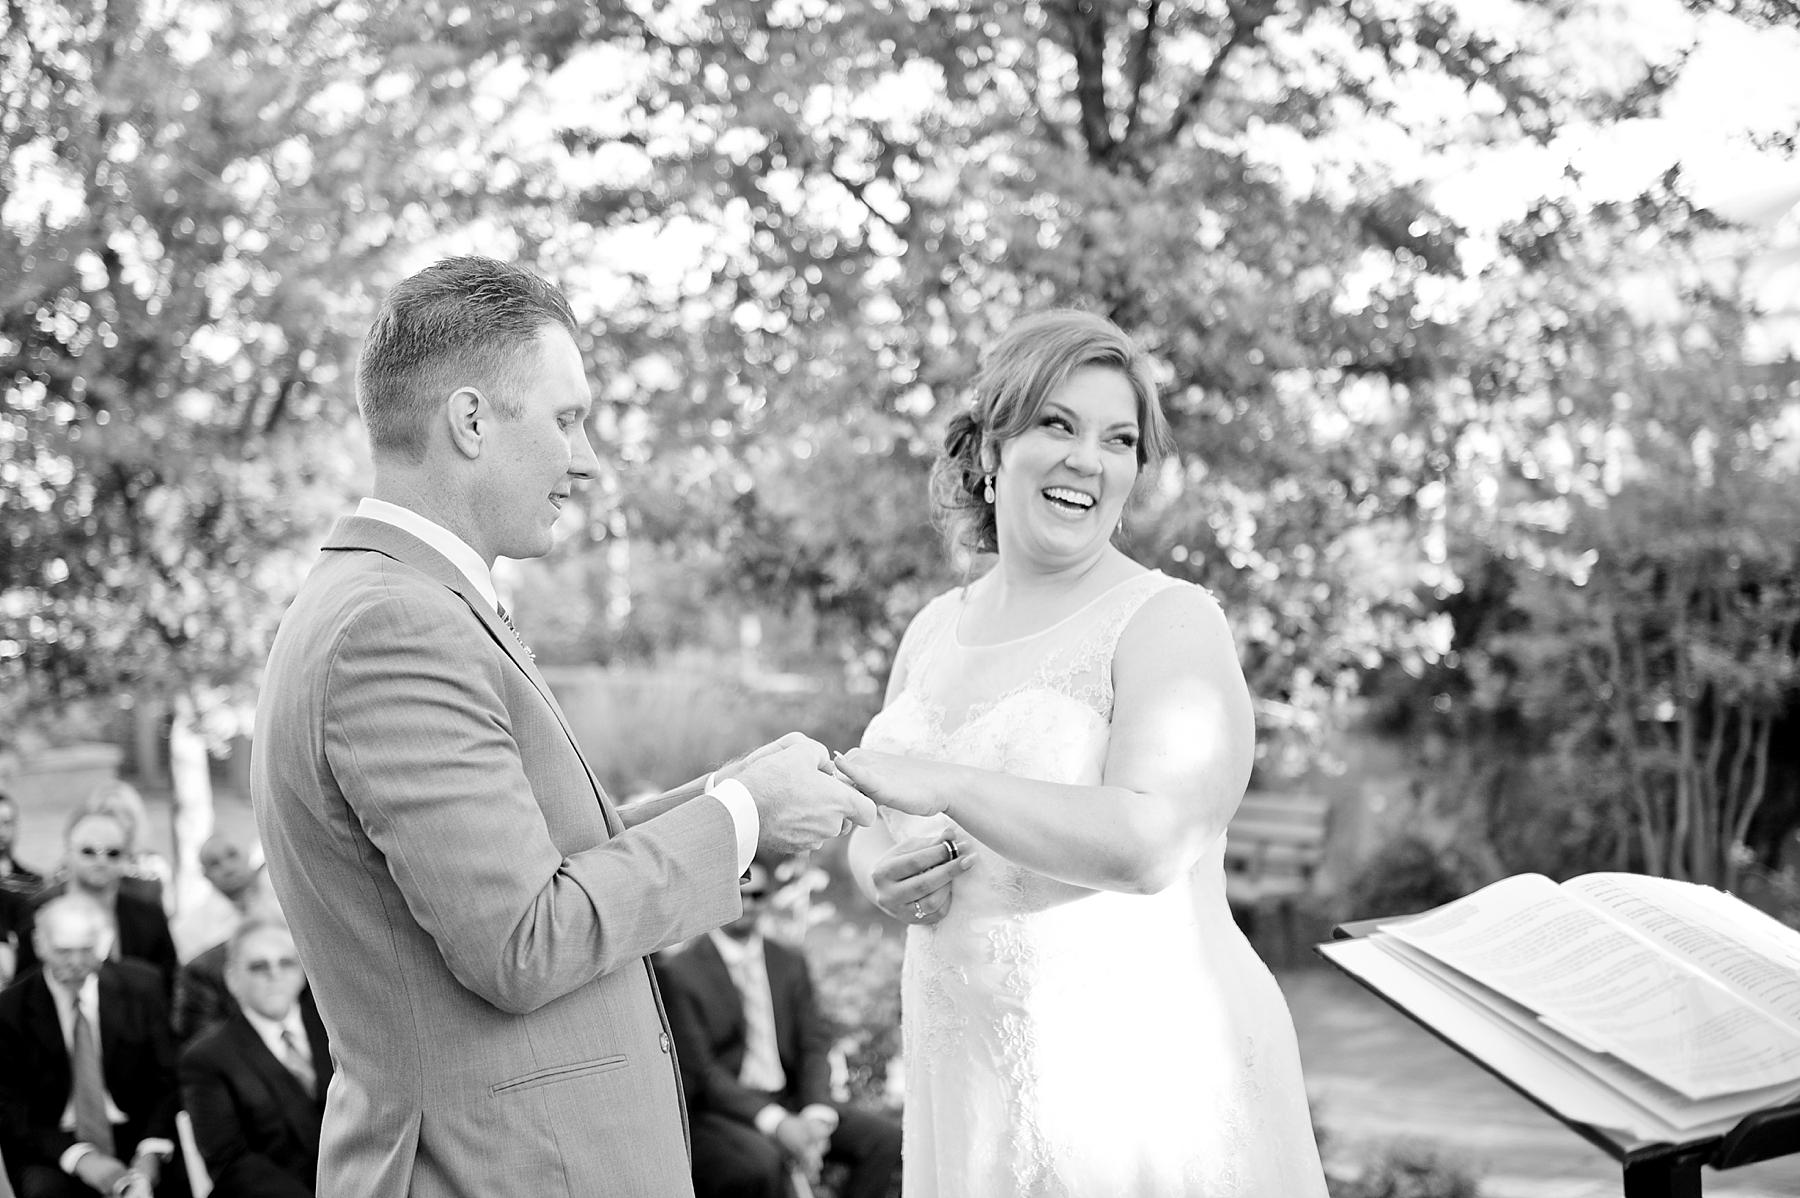 springs_preserve_las_vegas_wedding_photos-43.jpg